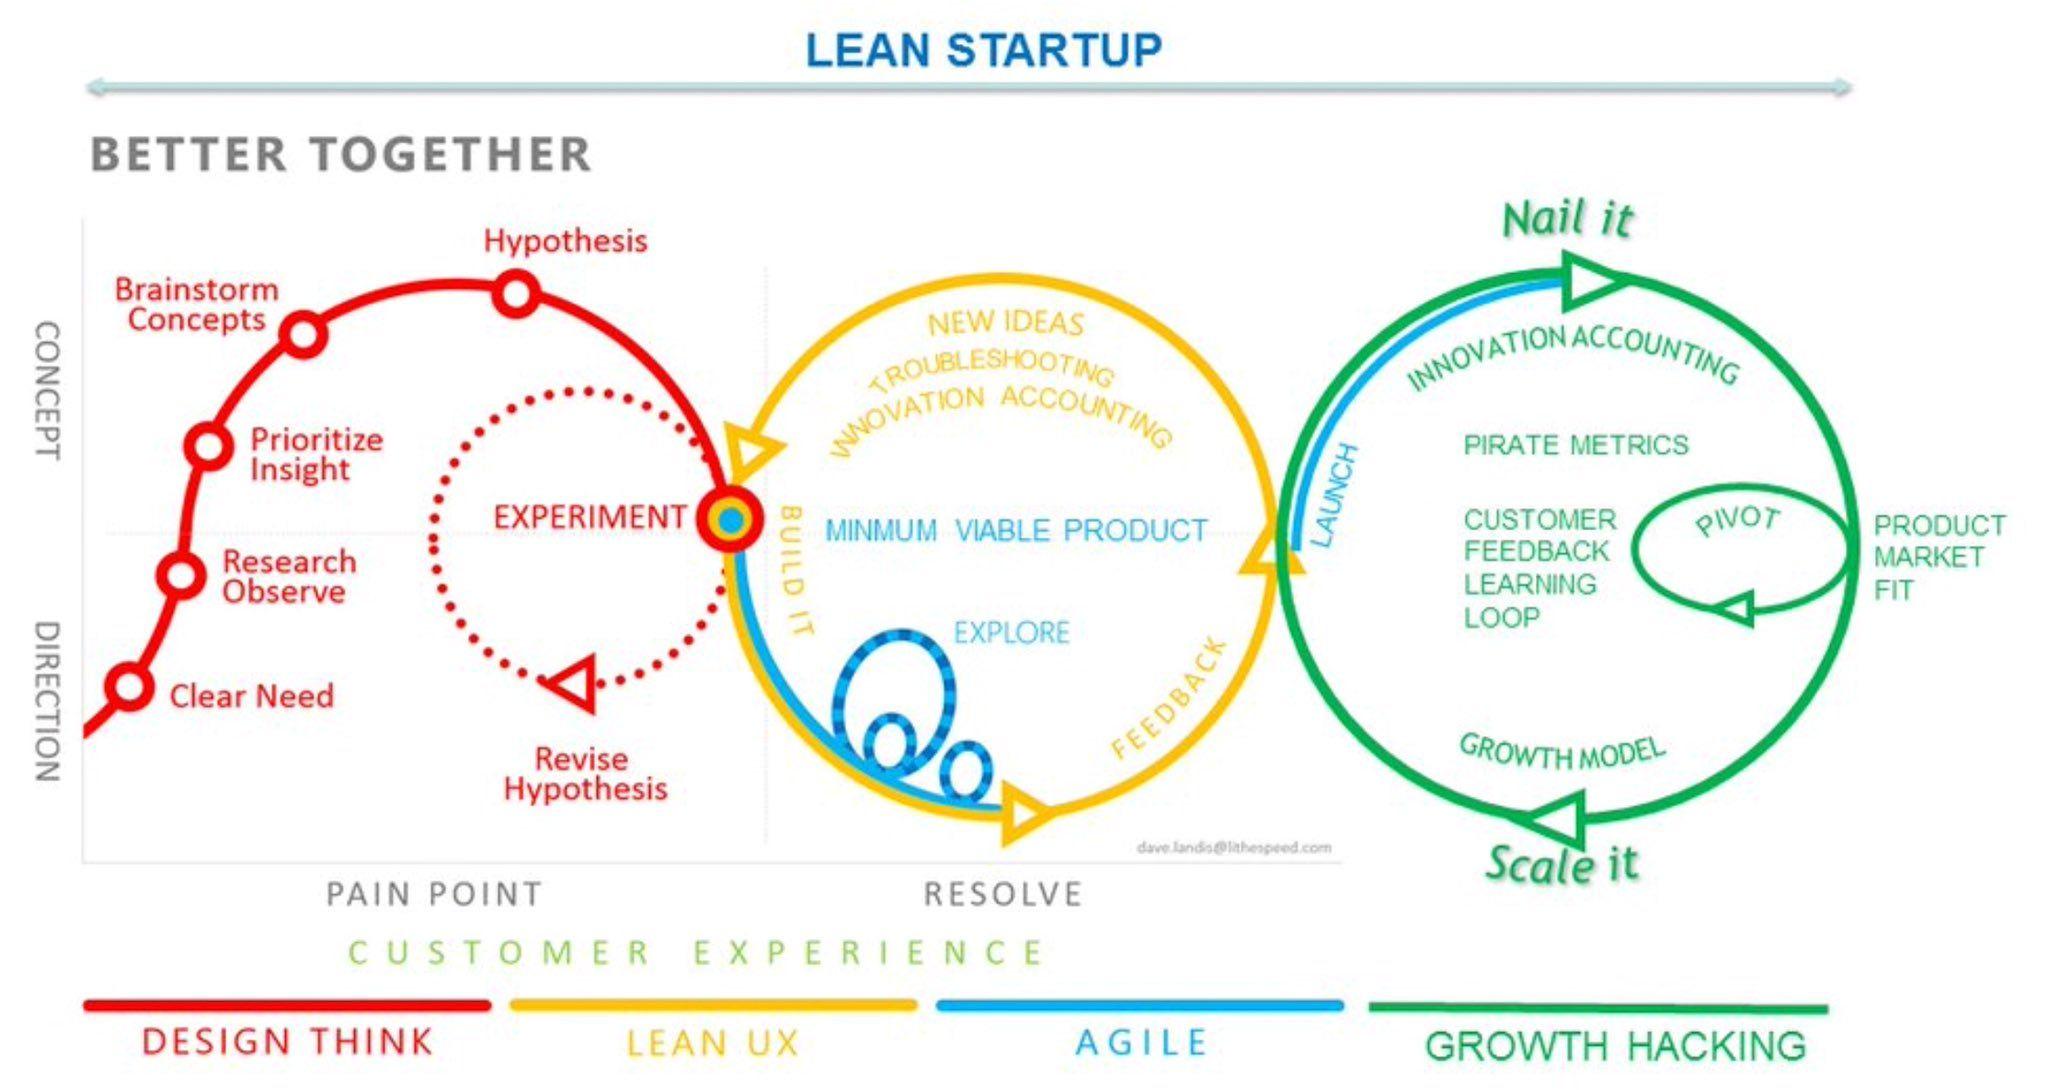 John Cutler On Twitter Design Thinking Lean Startup Customer Experience Design